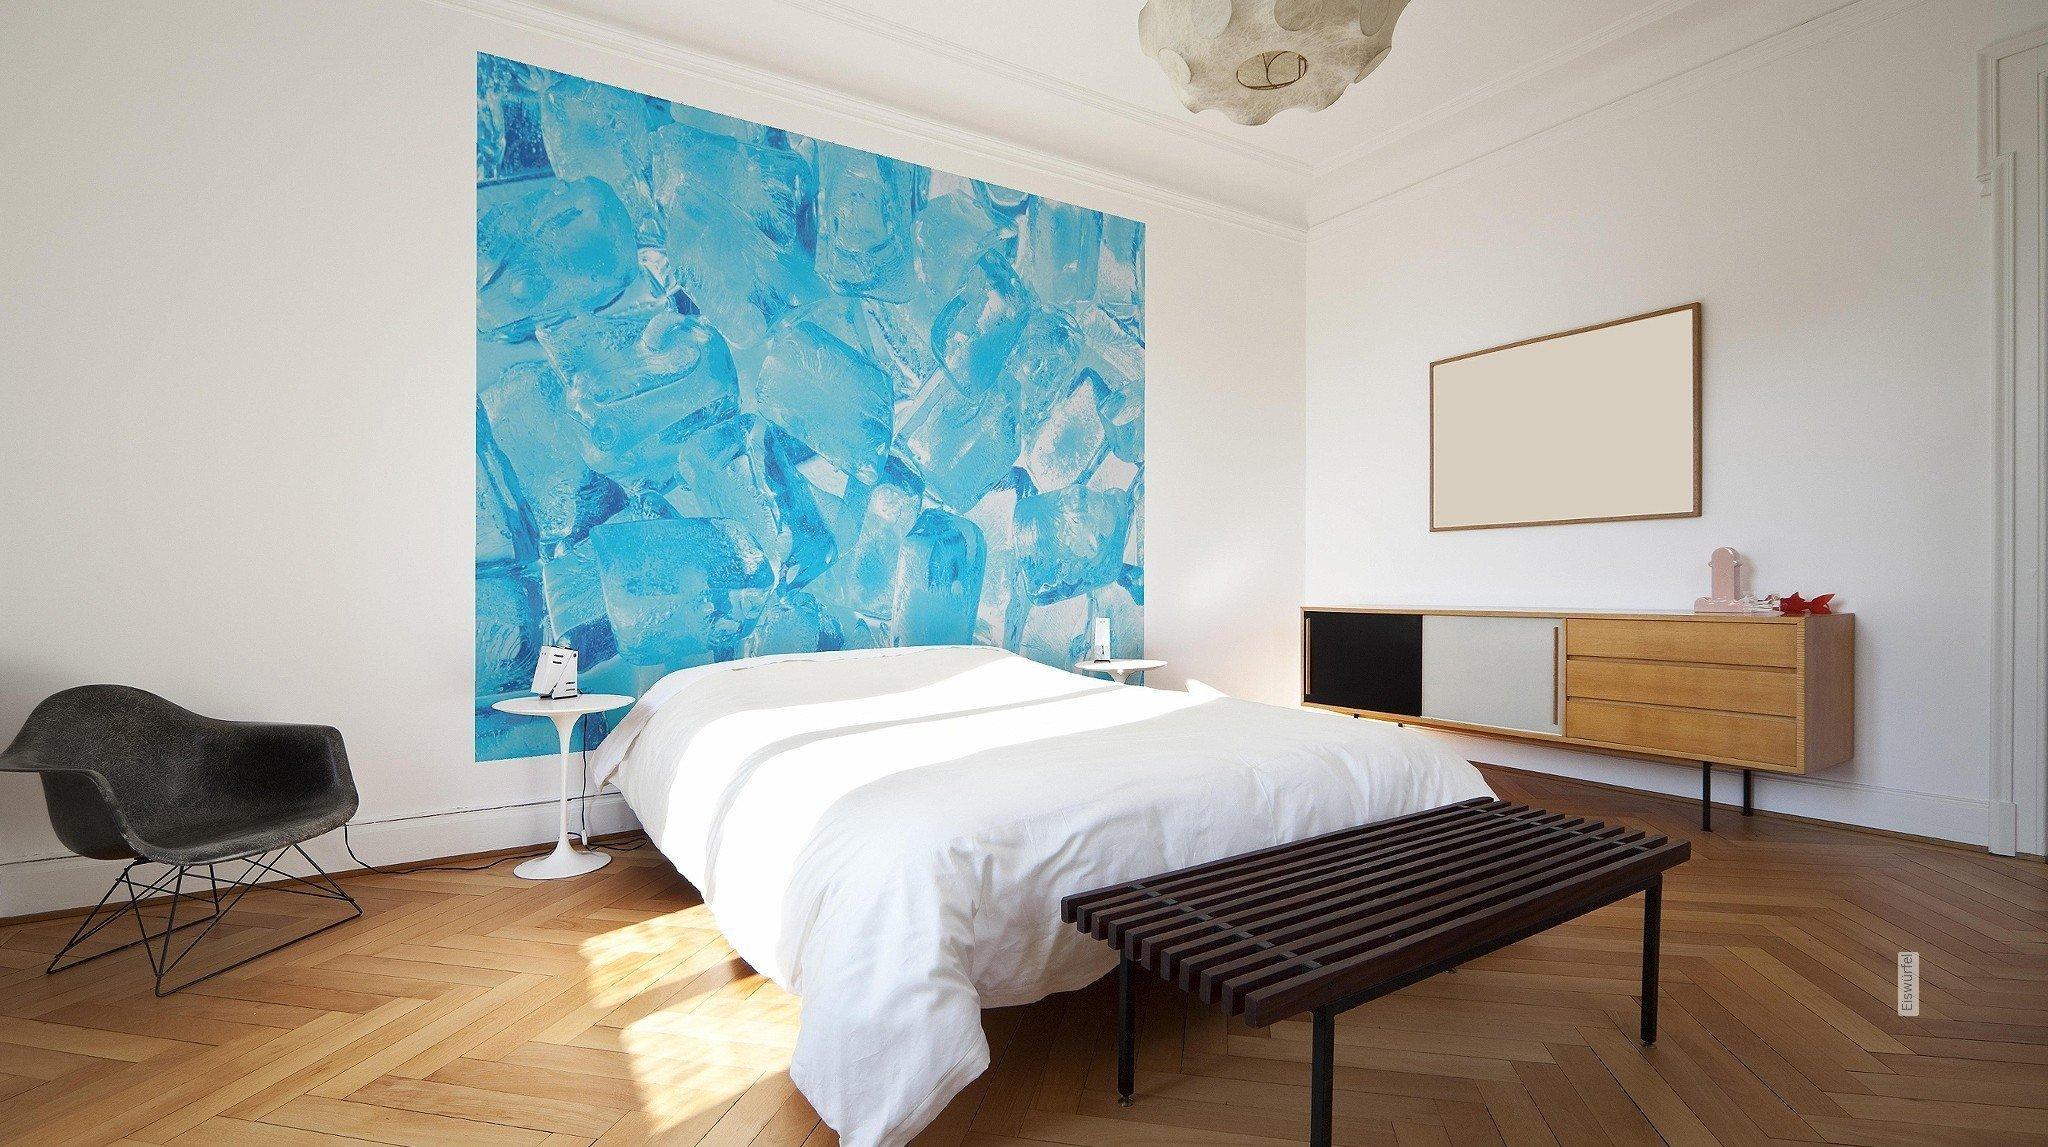 fototapeten aus aller welt die tapetenagentur. Black Bedroom Furniture Sets. Home Design Ideas